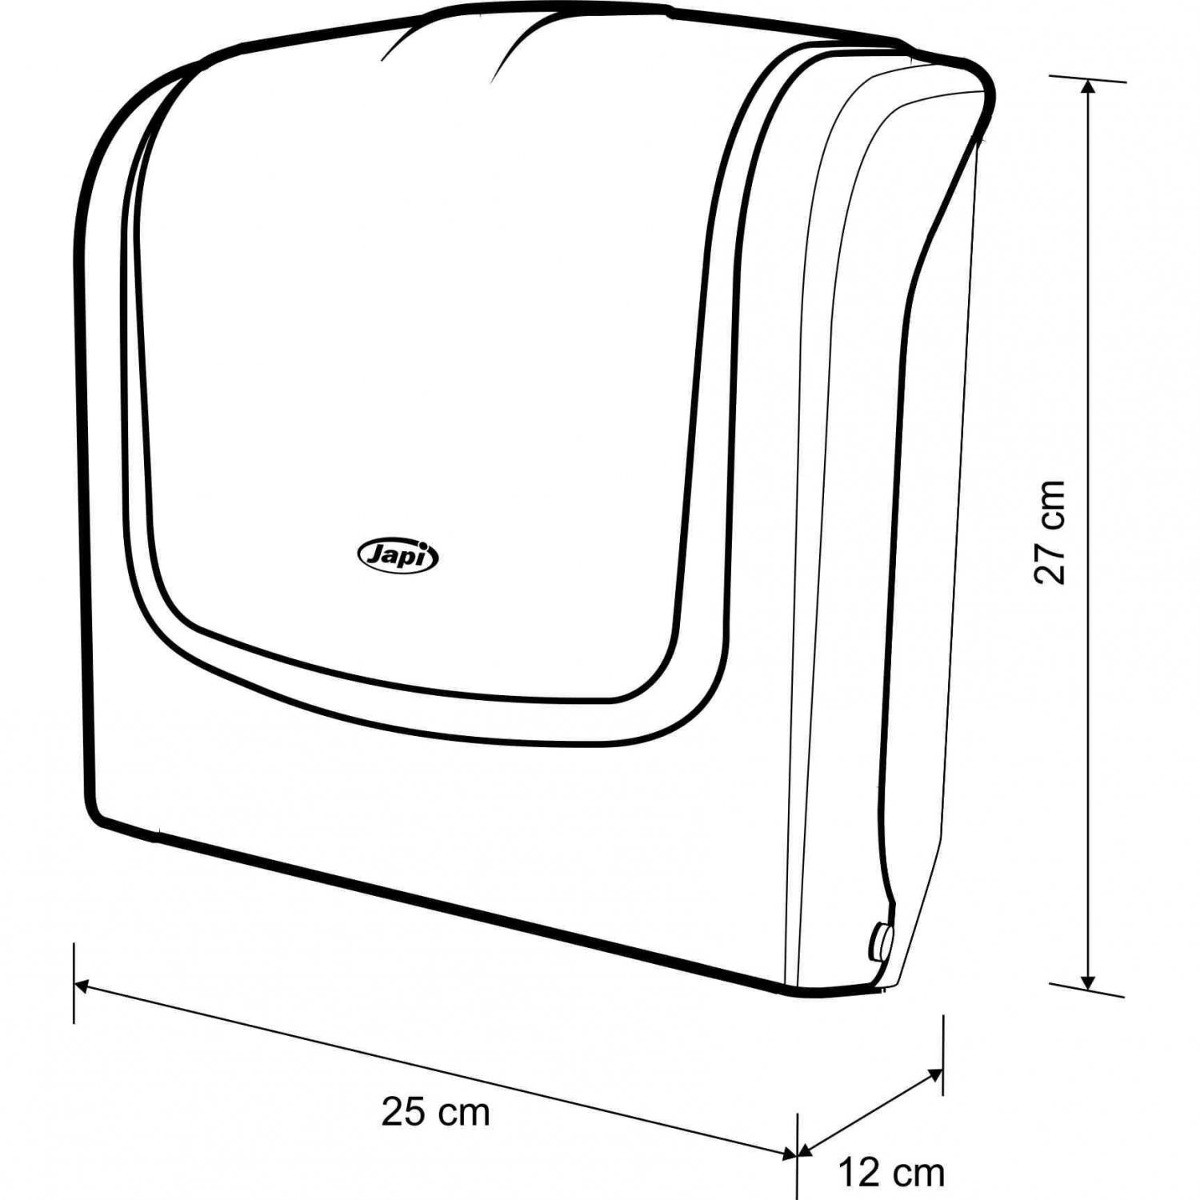 Foto2 - Porta Papel Toalha Interfolha Higiene e Limpeza - Japi